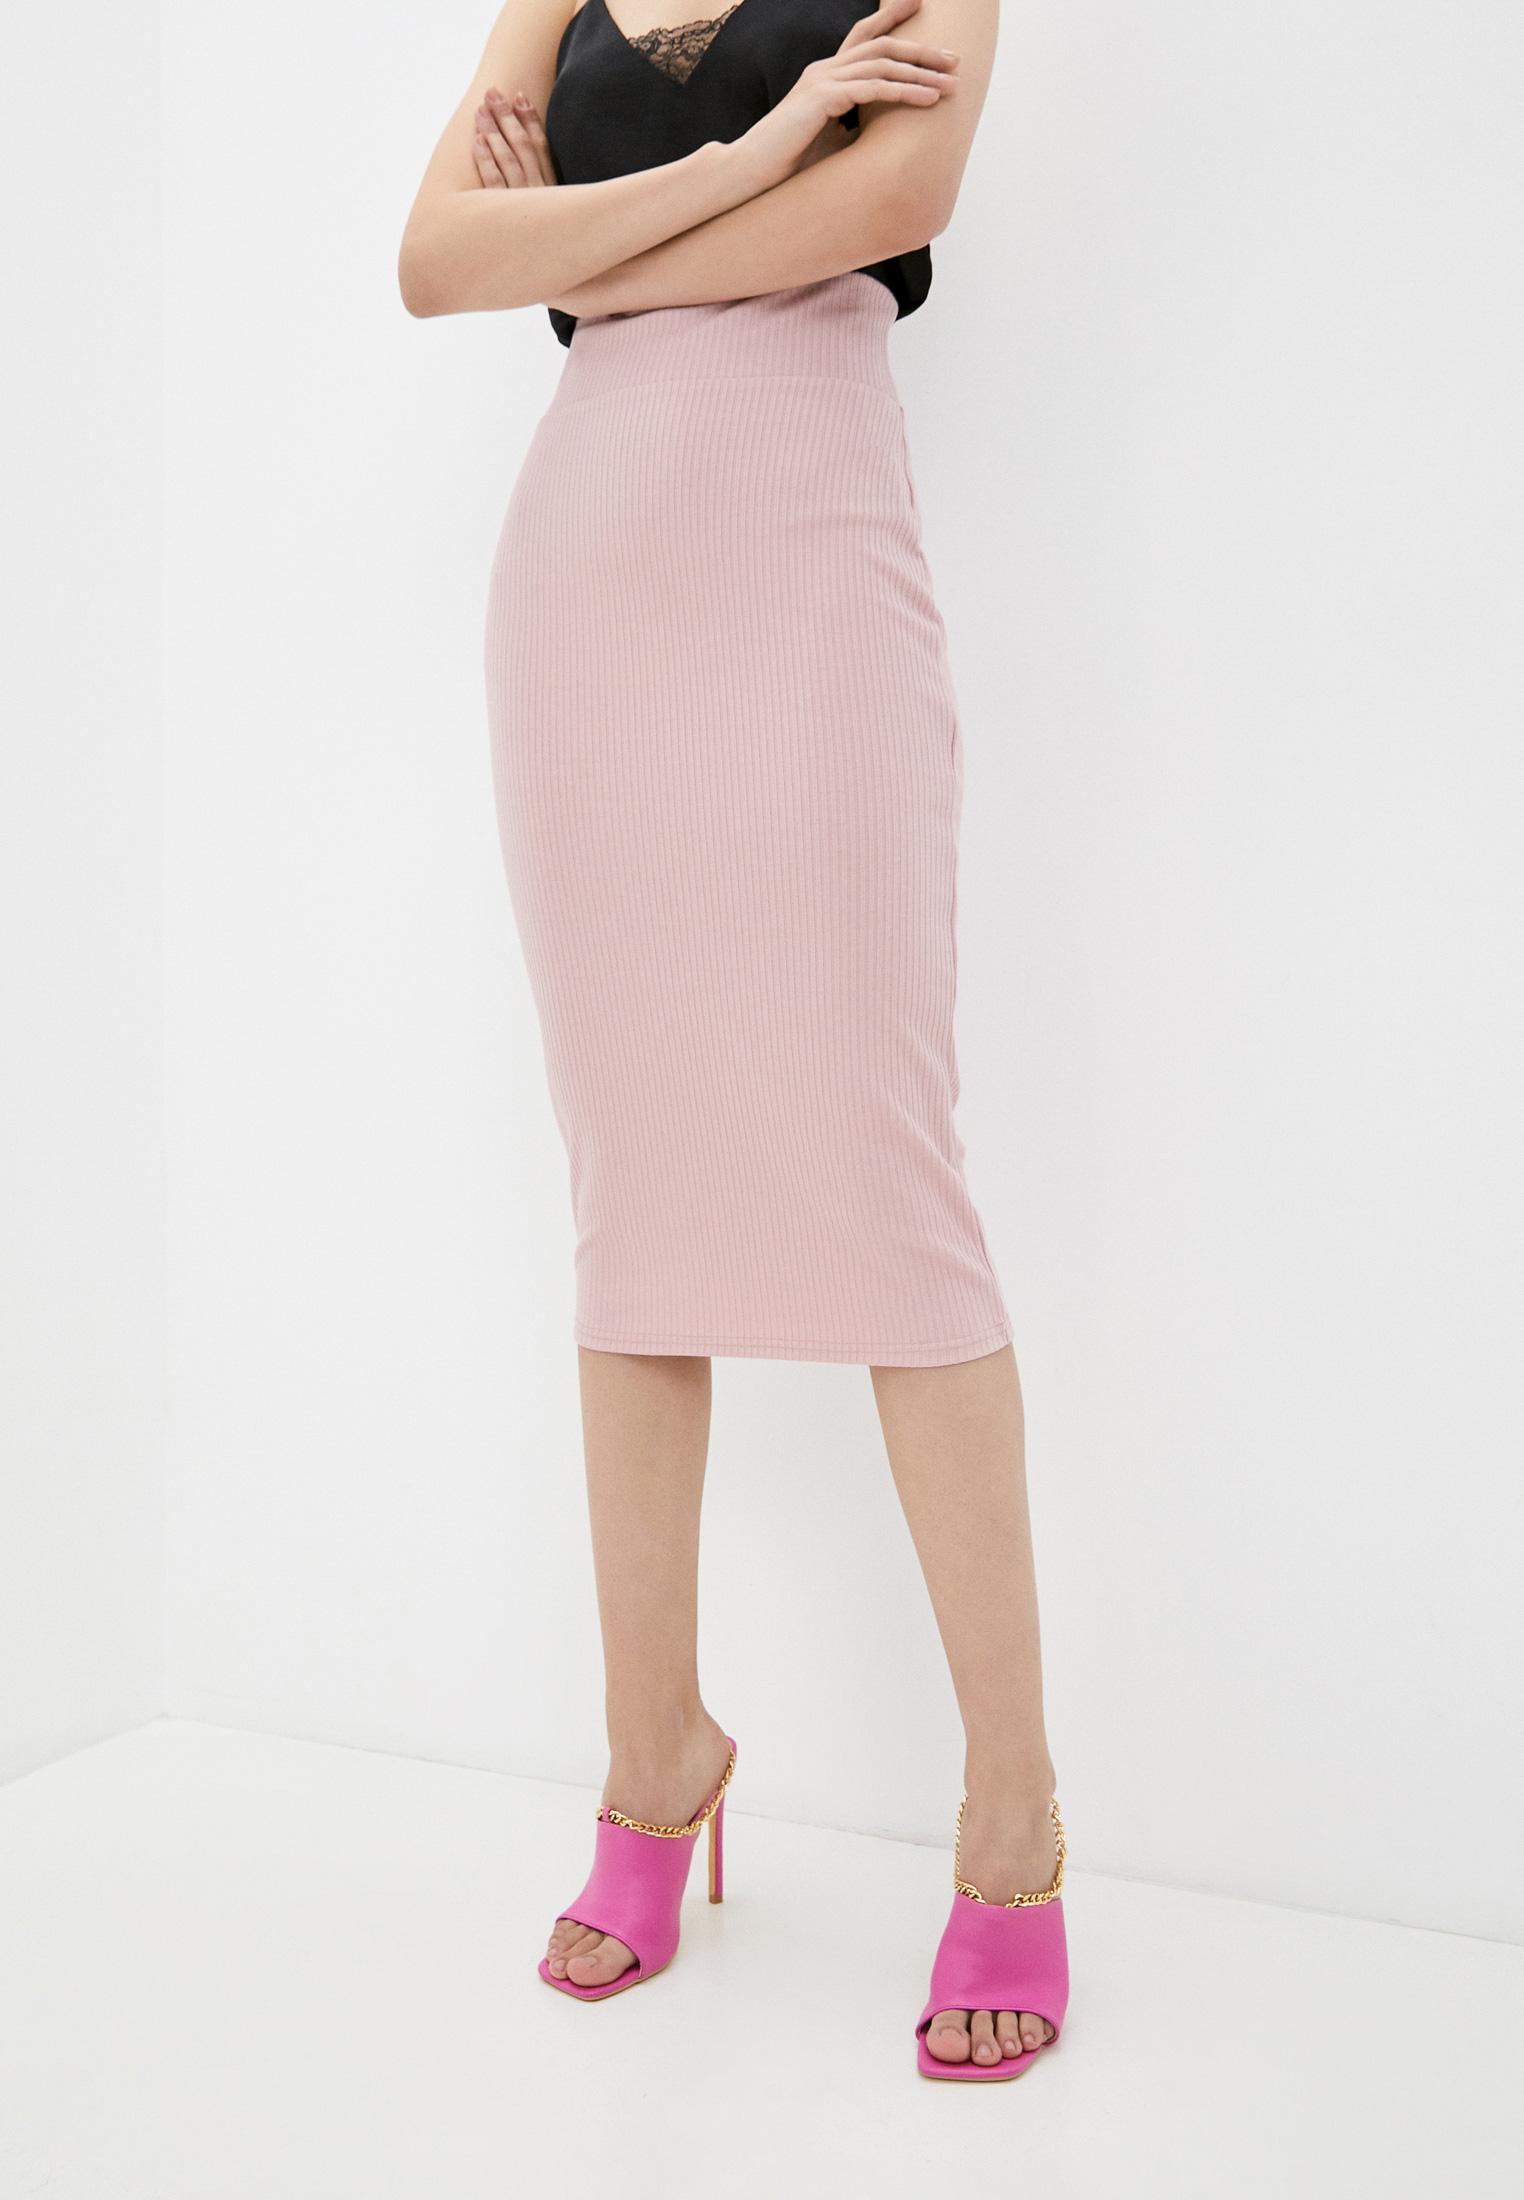 Узкая юбка TrendyAngel (Тренди Энджел) Юбка TrendyAngel